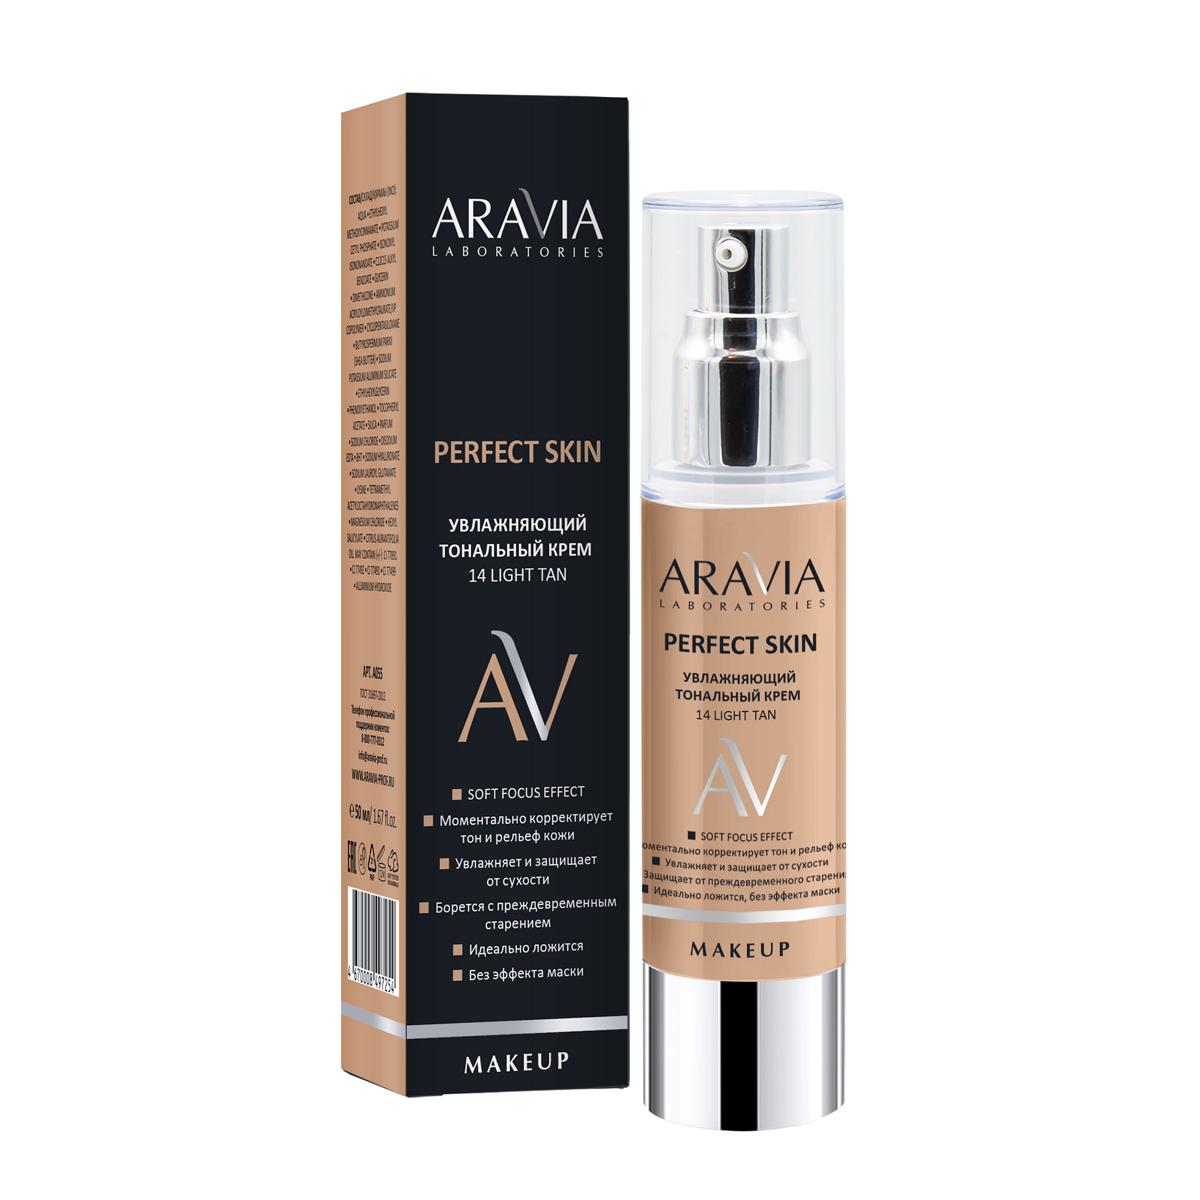 Aravia Laboratories Увлажняющий тональный крем Perfect Skin 14 Light tan, 50 мл (Aravia Laboratories, Уход за лицом)